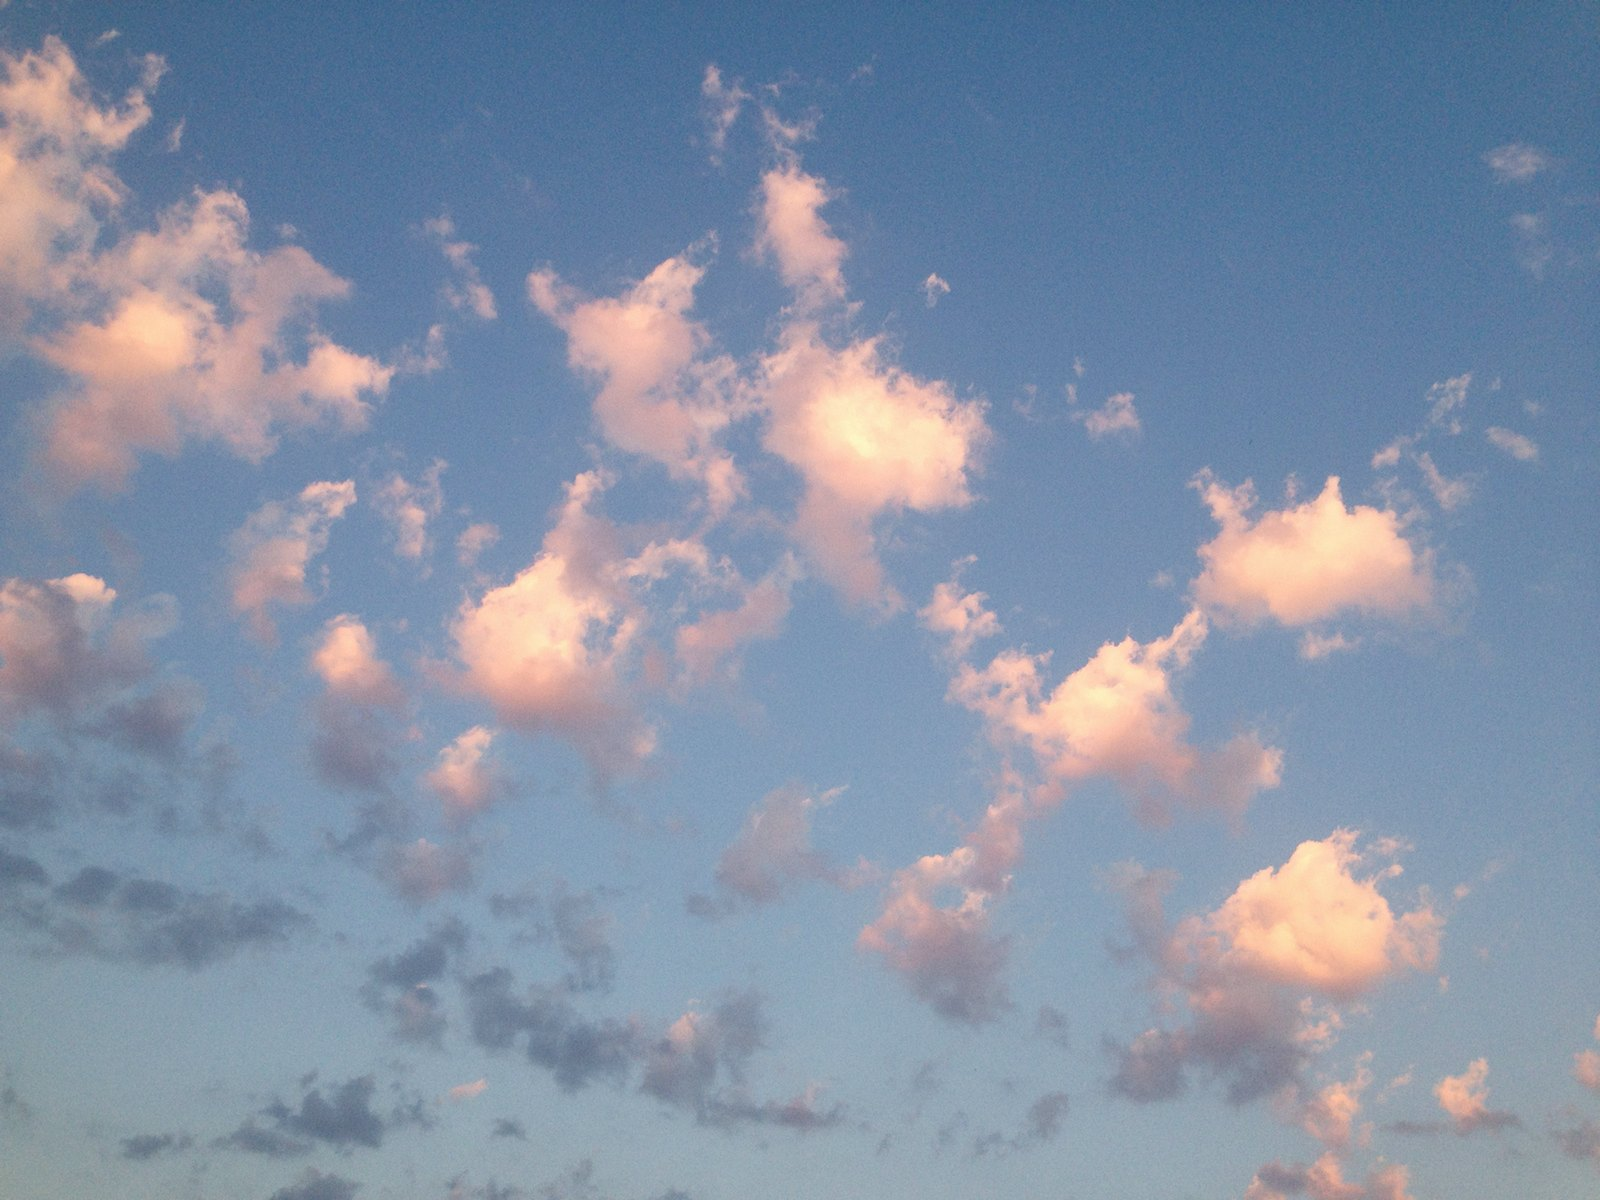 Pink clouds, 2014, giclée print, 45 x 60 cm, ed. 5